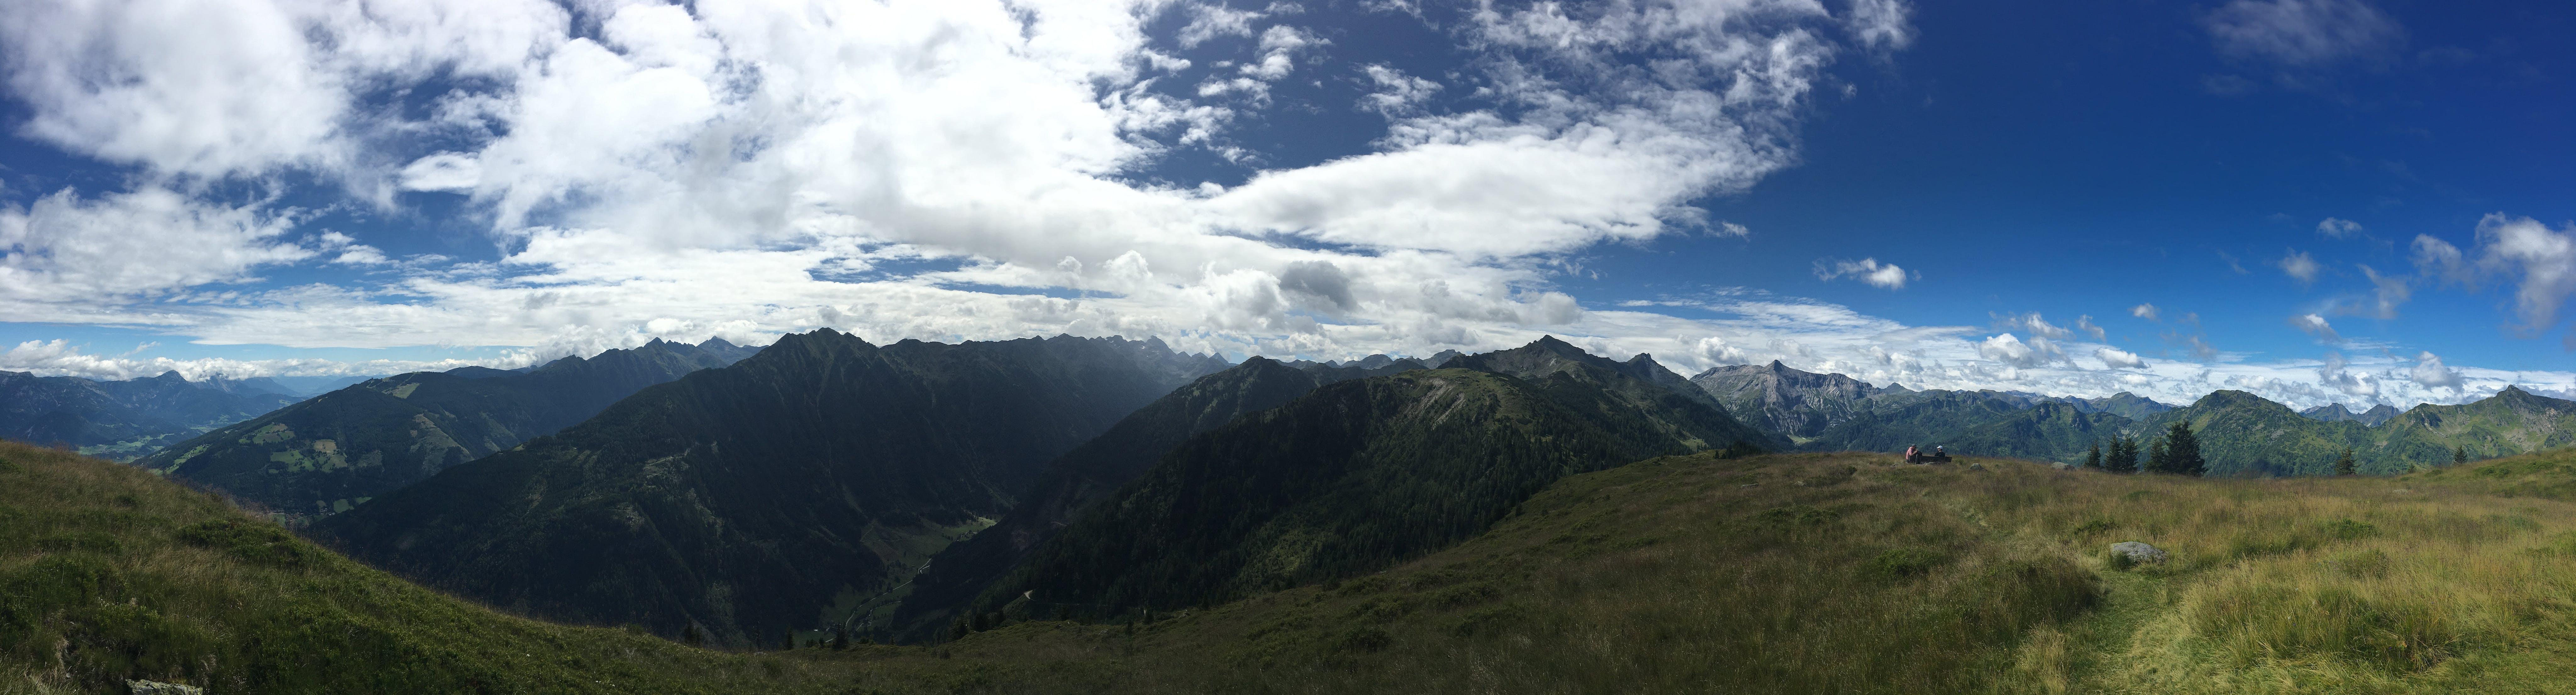 Free stock photo of hiking, Hochwurzen Höhenweg, mountain, wanderlust